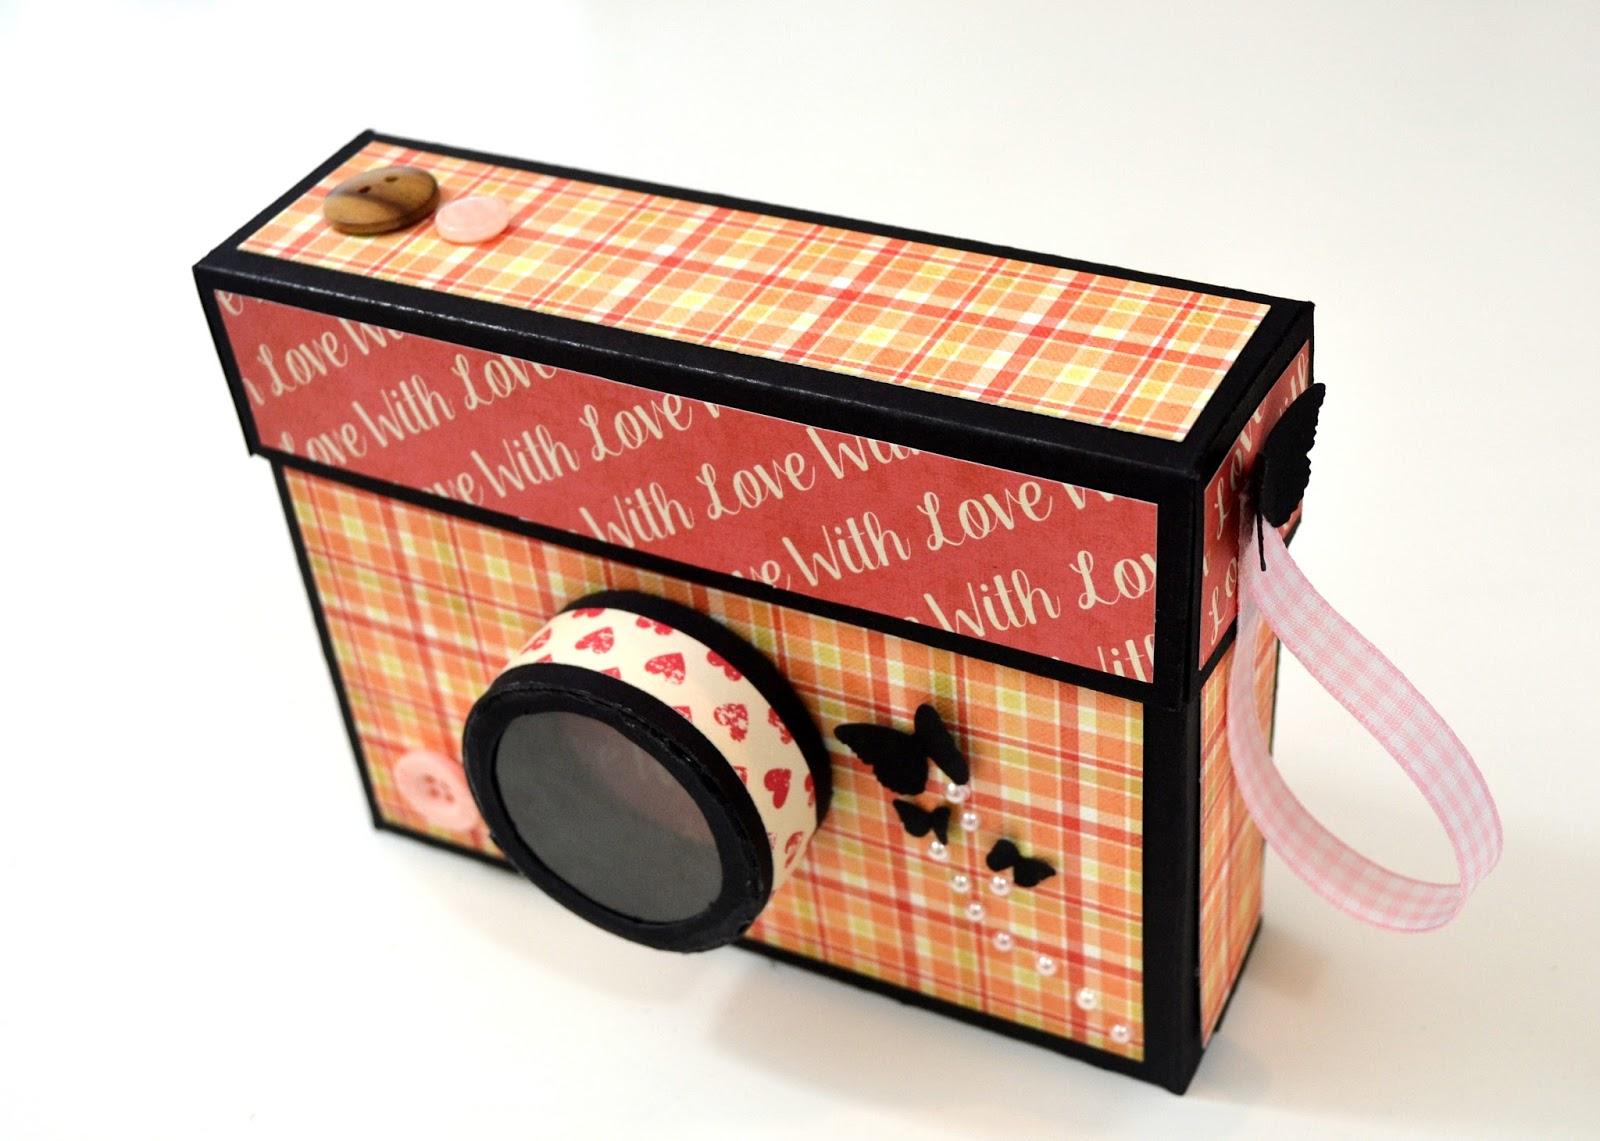 Diy Paper Crafts Giulias Art Diy Paper Crafts How To Make